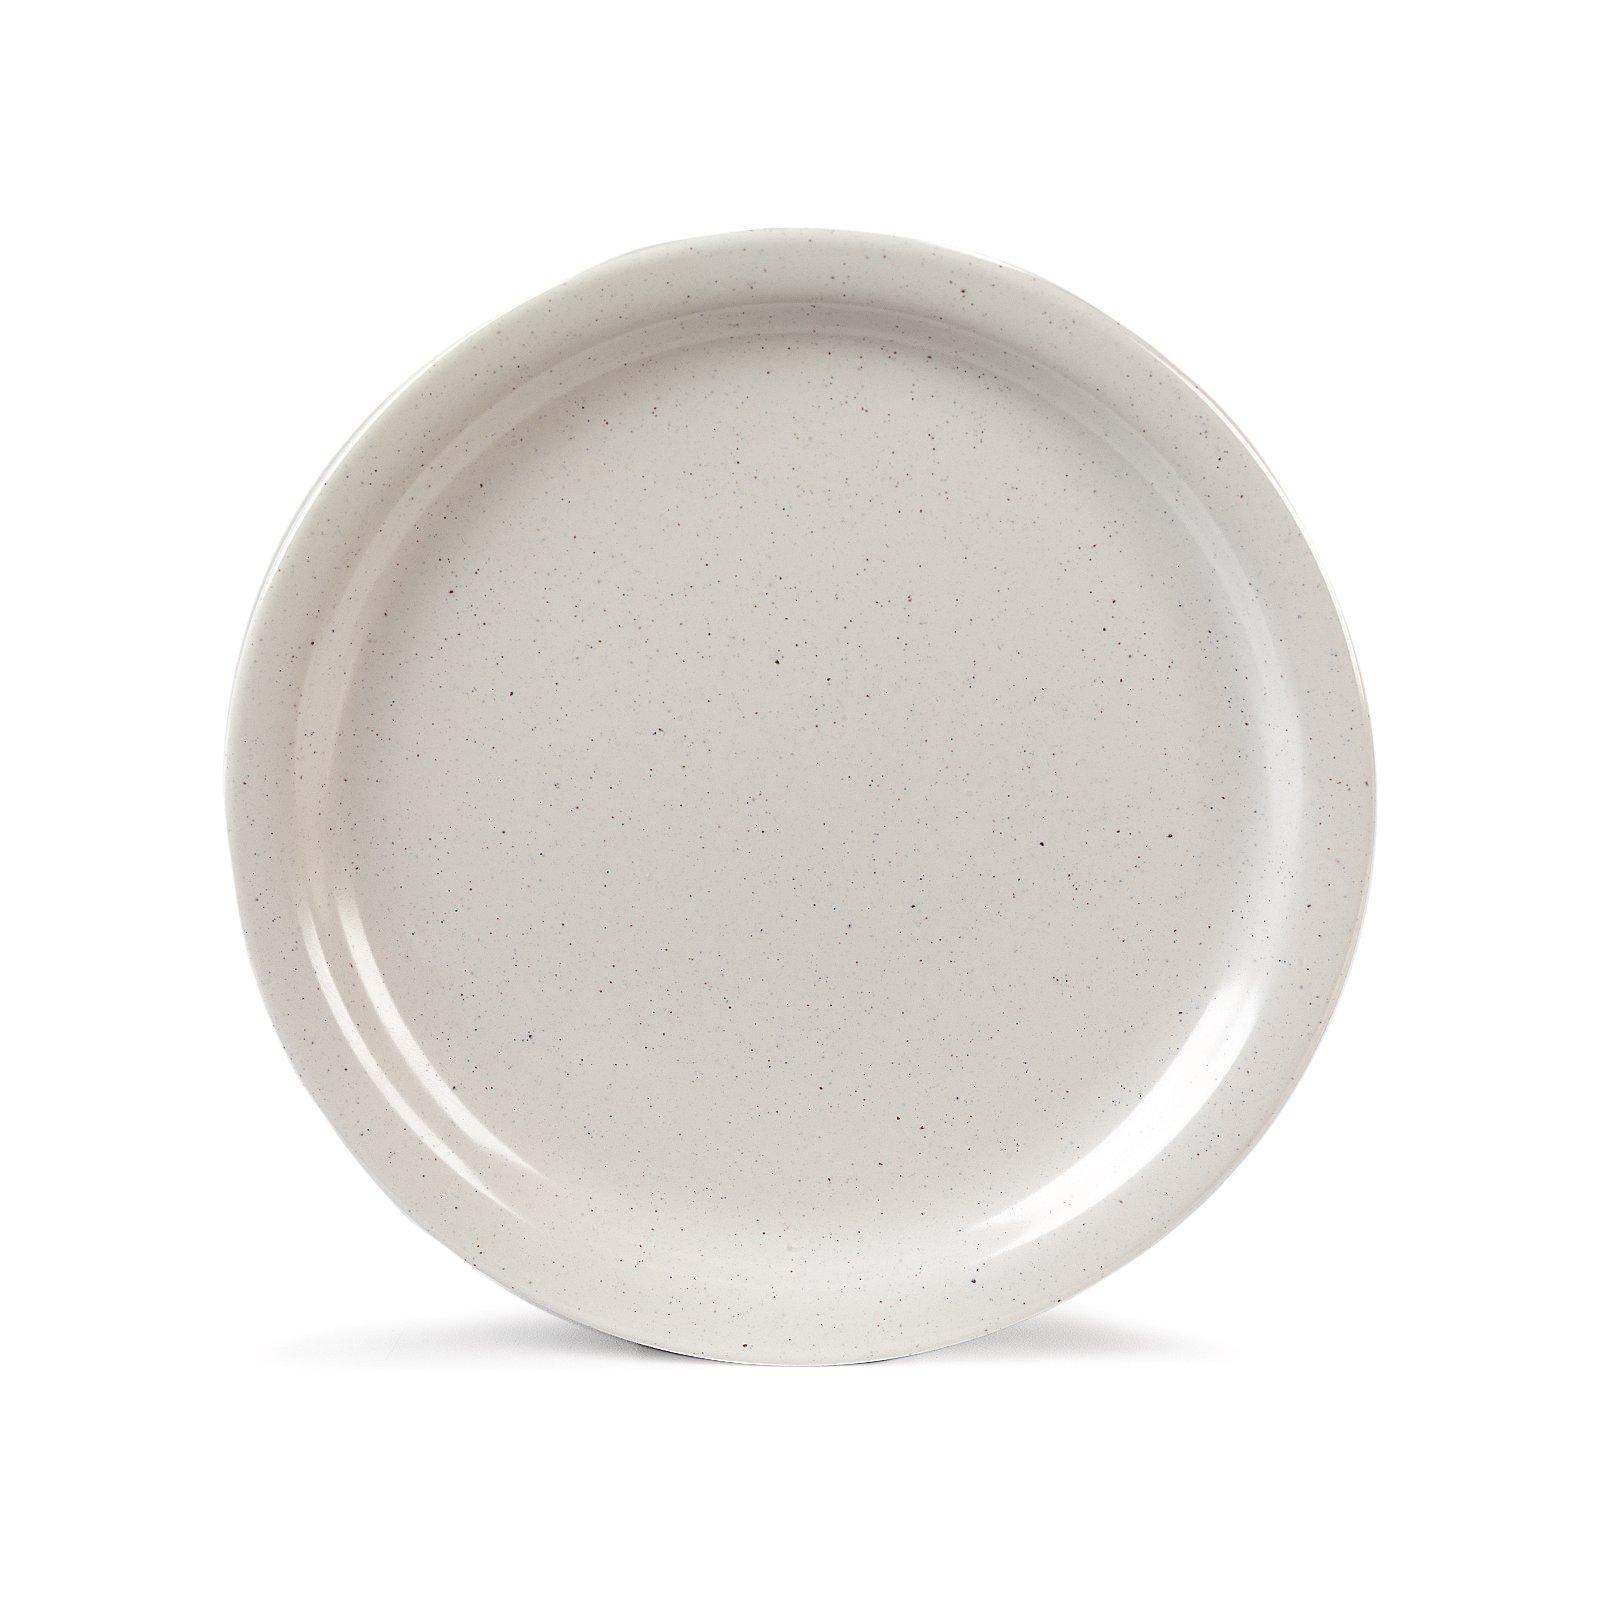 KL20070 - Kingline™ Melamine Dinner Plate 9  - Adobe  sc 1 st  Carlisle FoodService Products & KL20070 - Kingline™ Melamine Dinner Plate 9